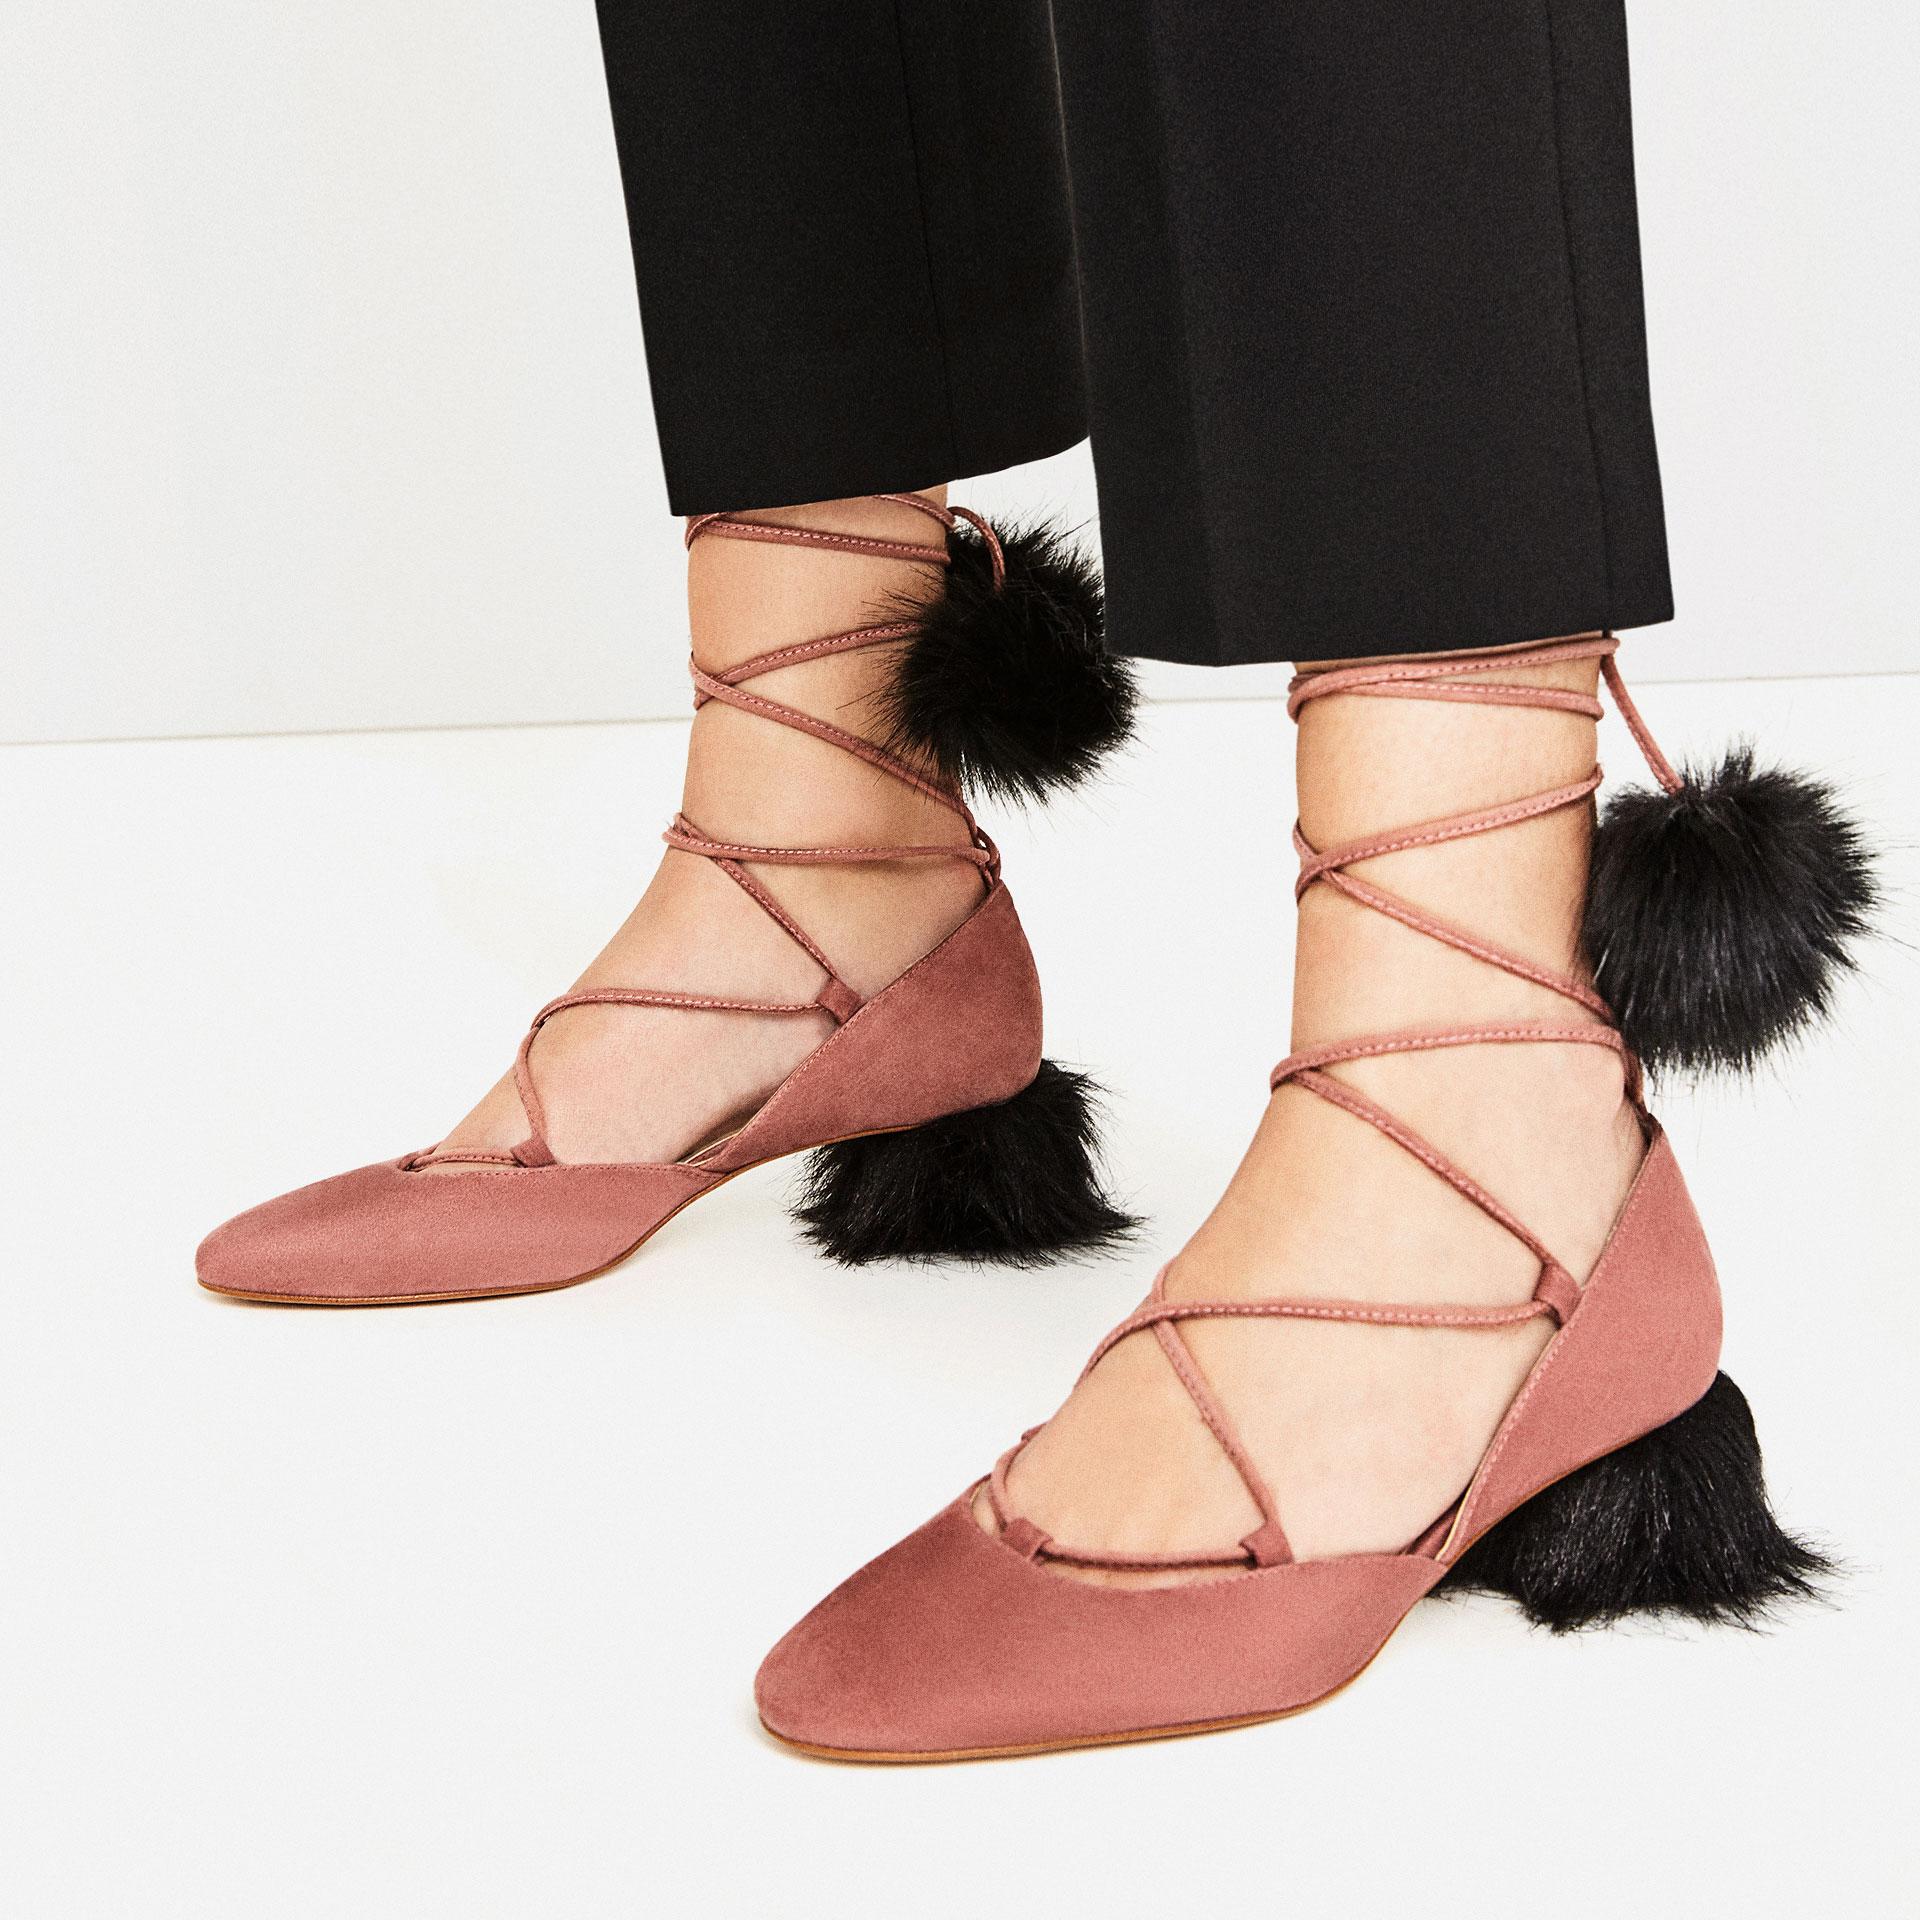 scarpe_2017_tacco_pelo_zara_lacup